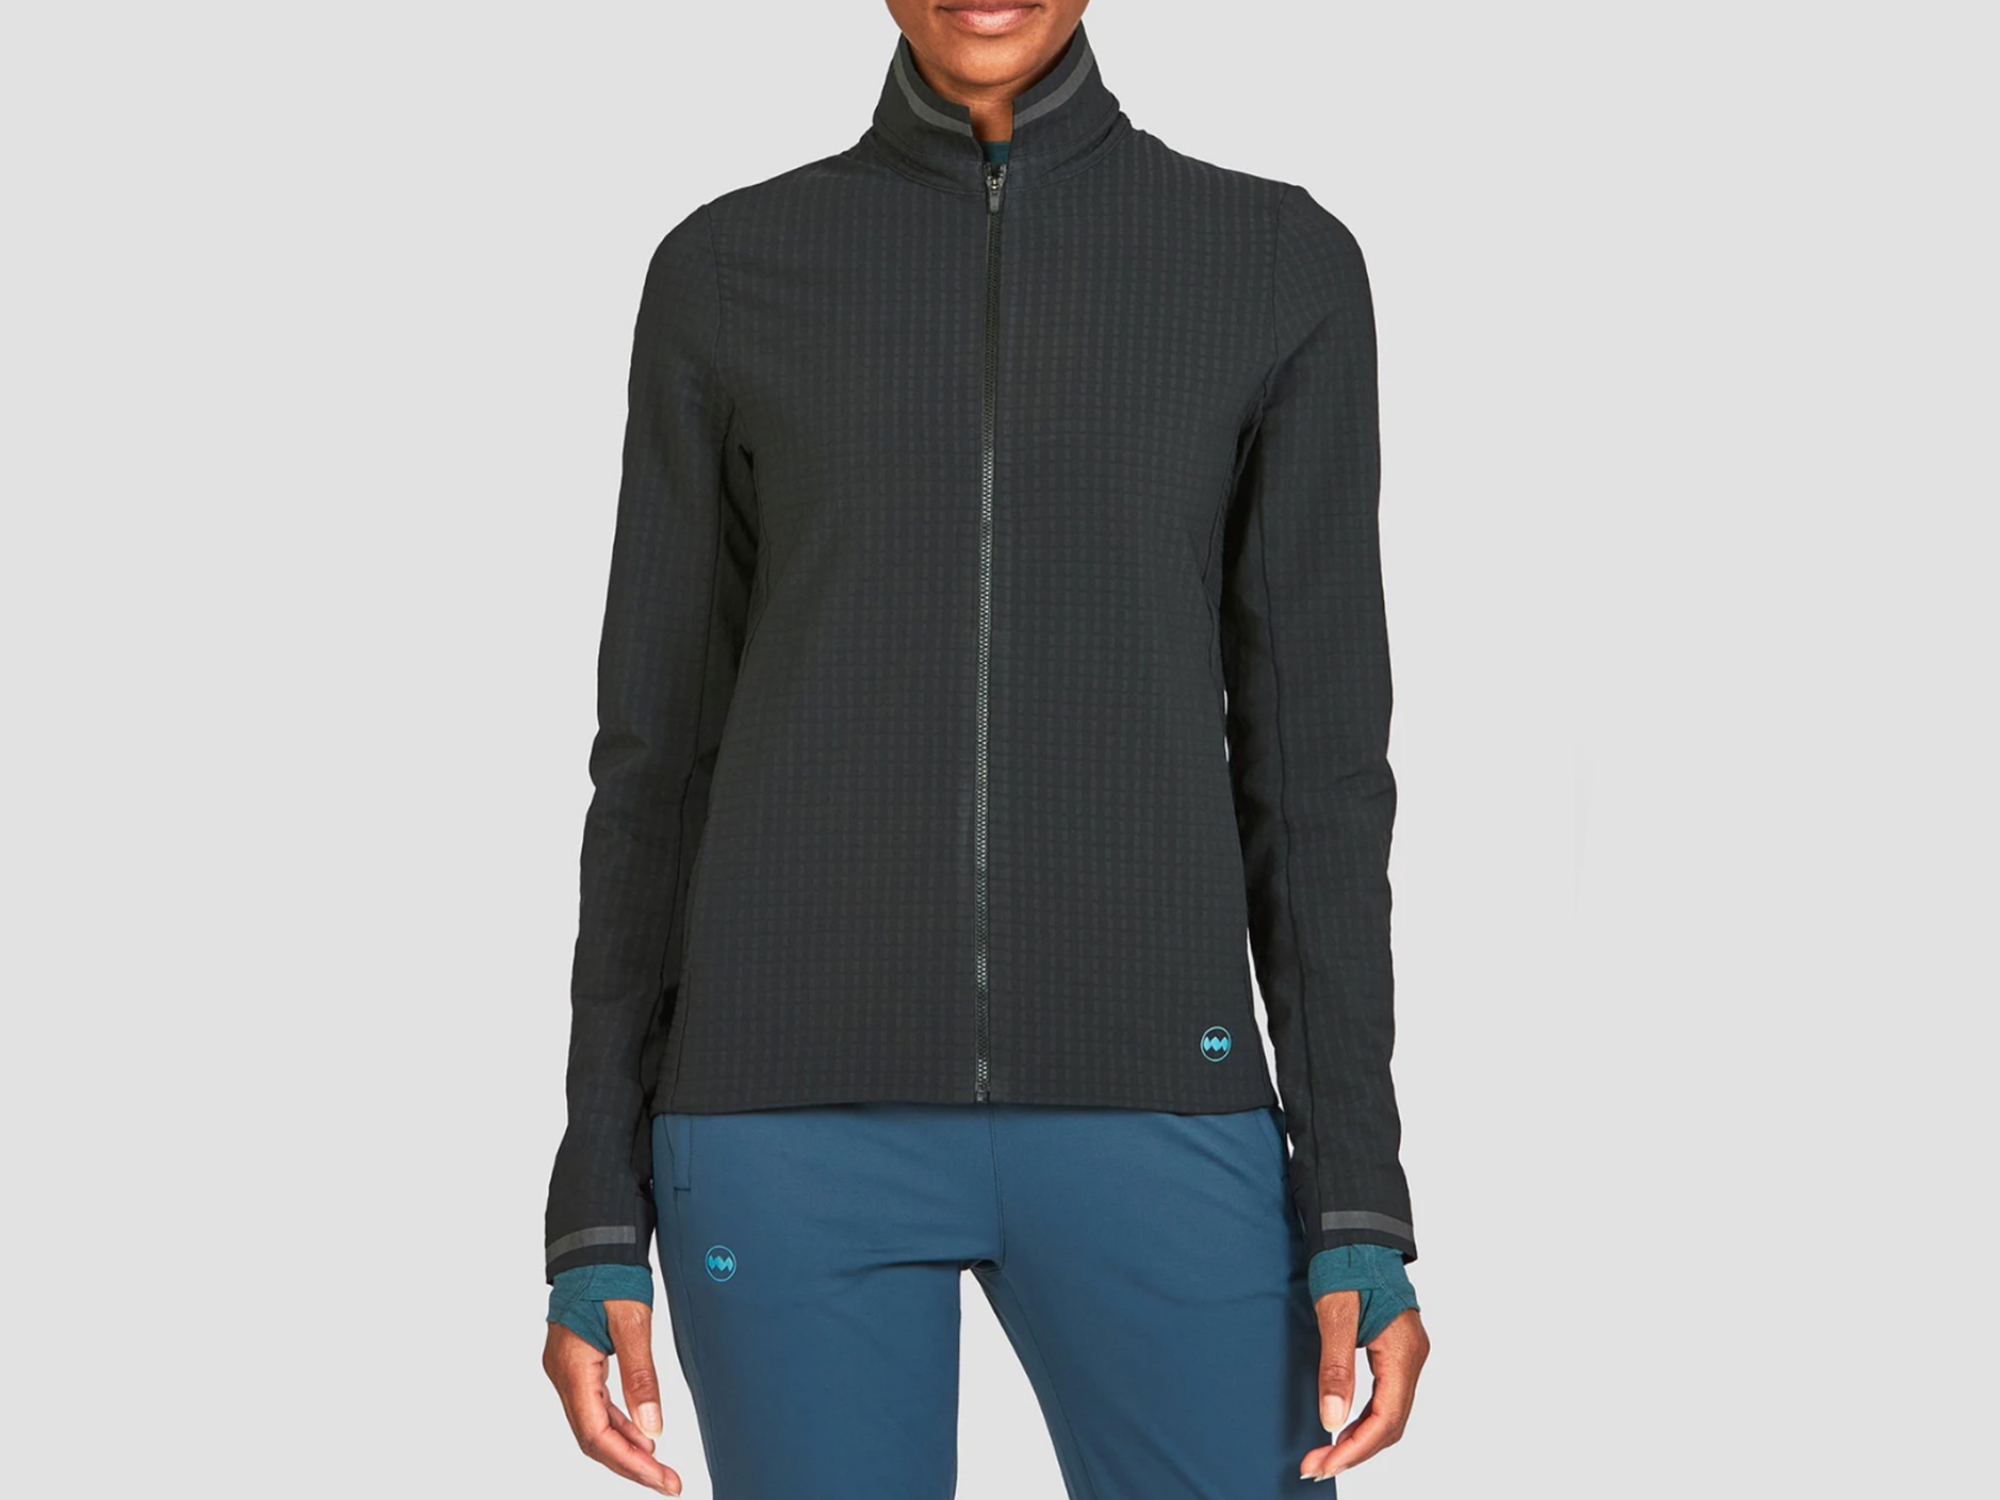 model from neck down wearing the Janji stormrunner fleece jacket in midnight black